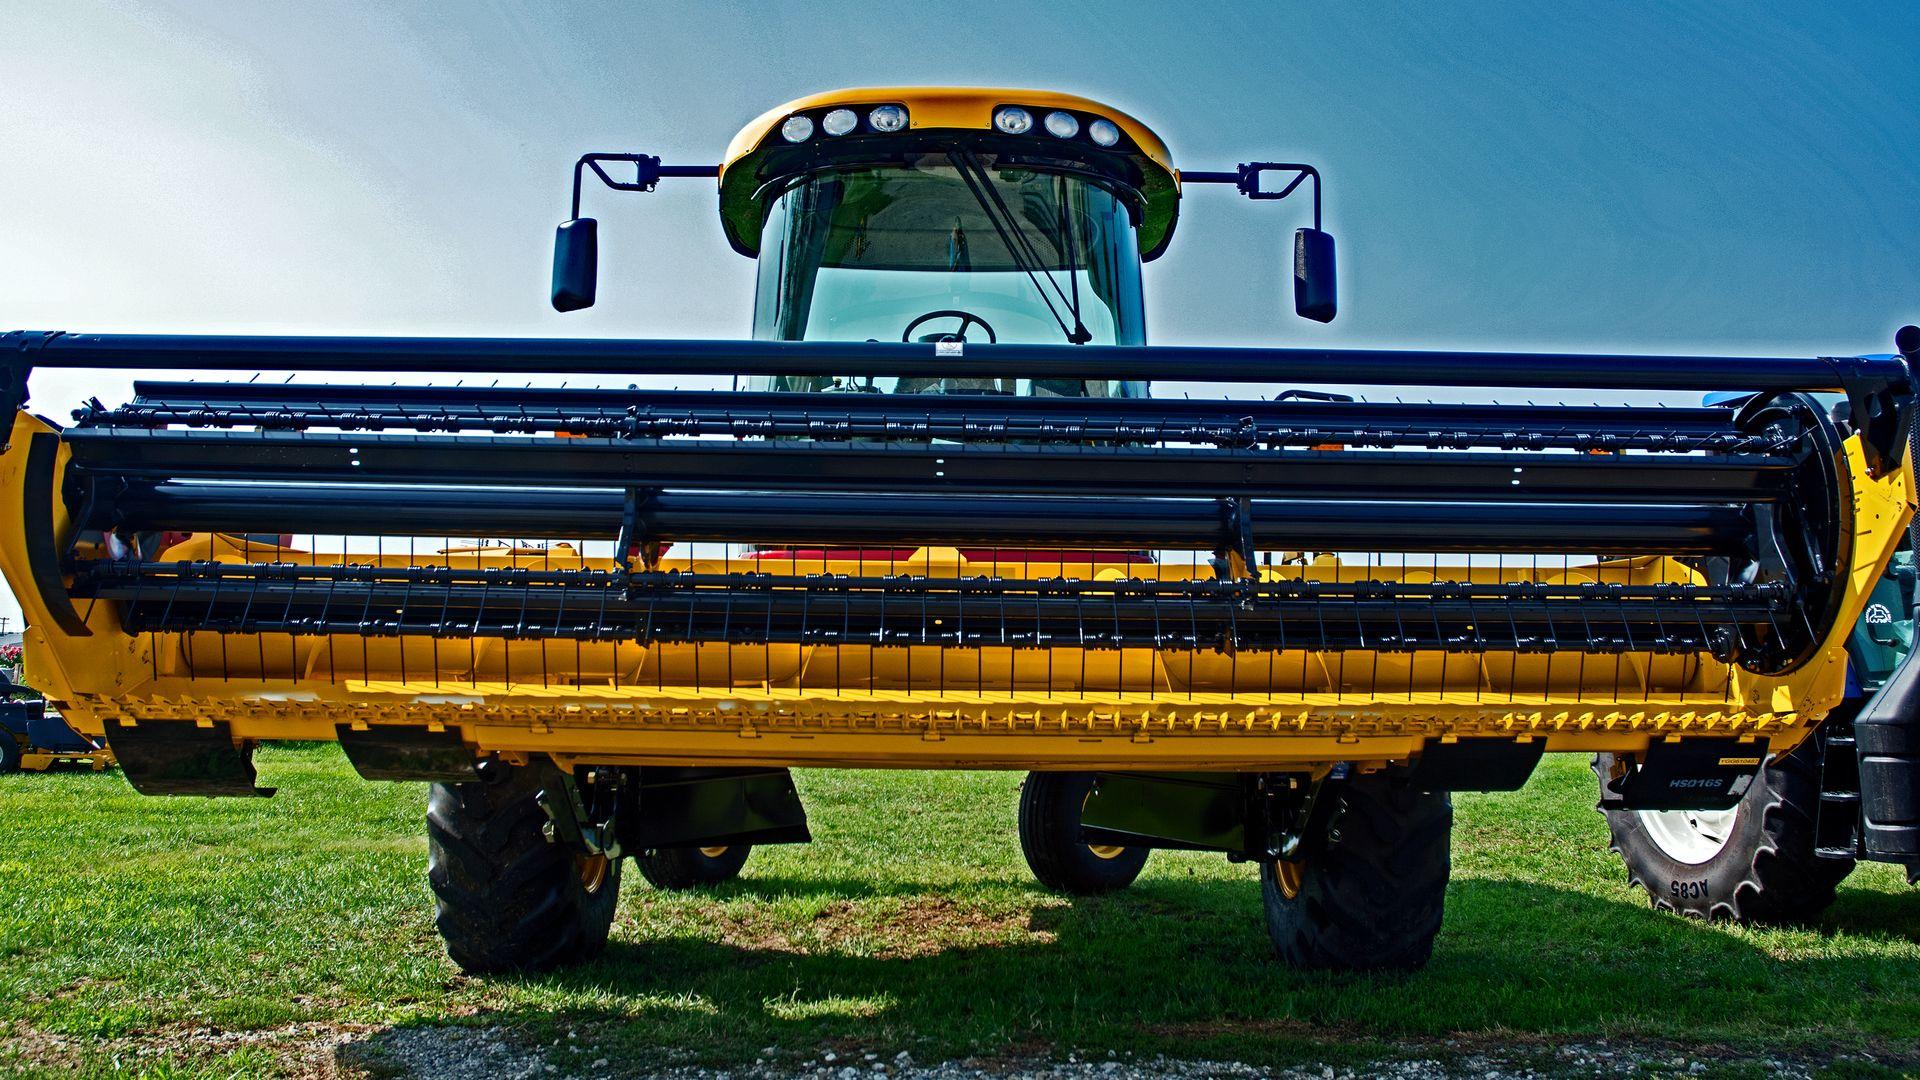 Crop harvestor